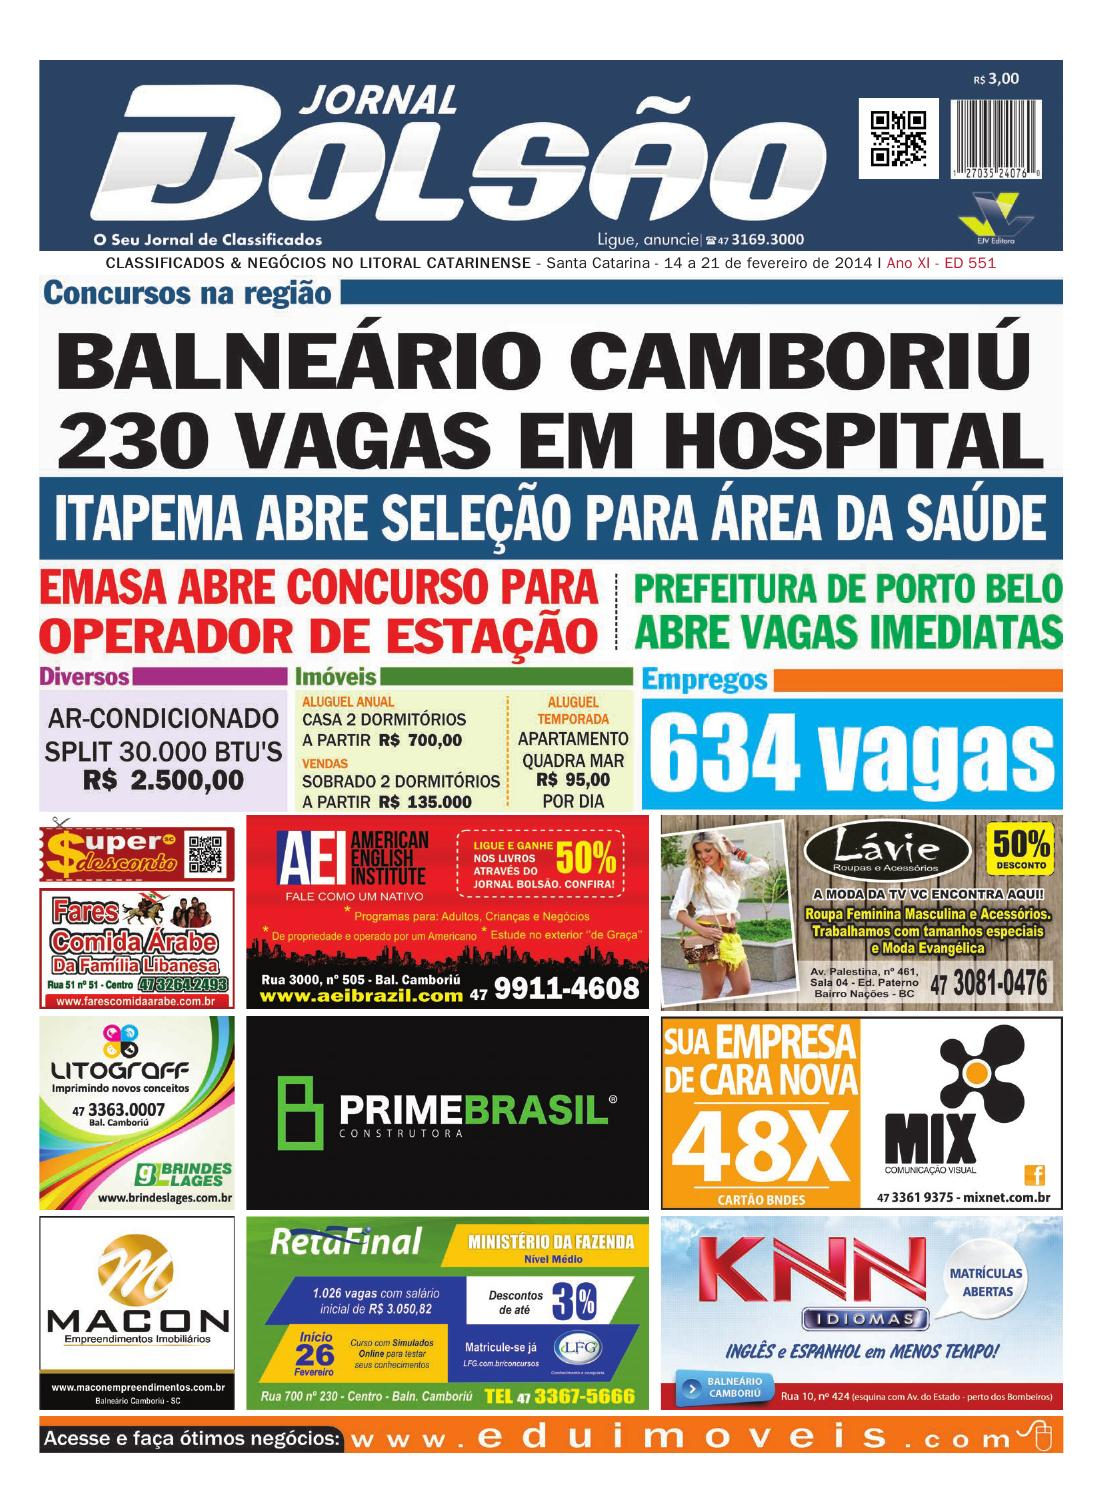 70e2182994 Ed 551 by Bolsão Jornal - issuu